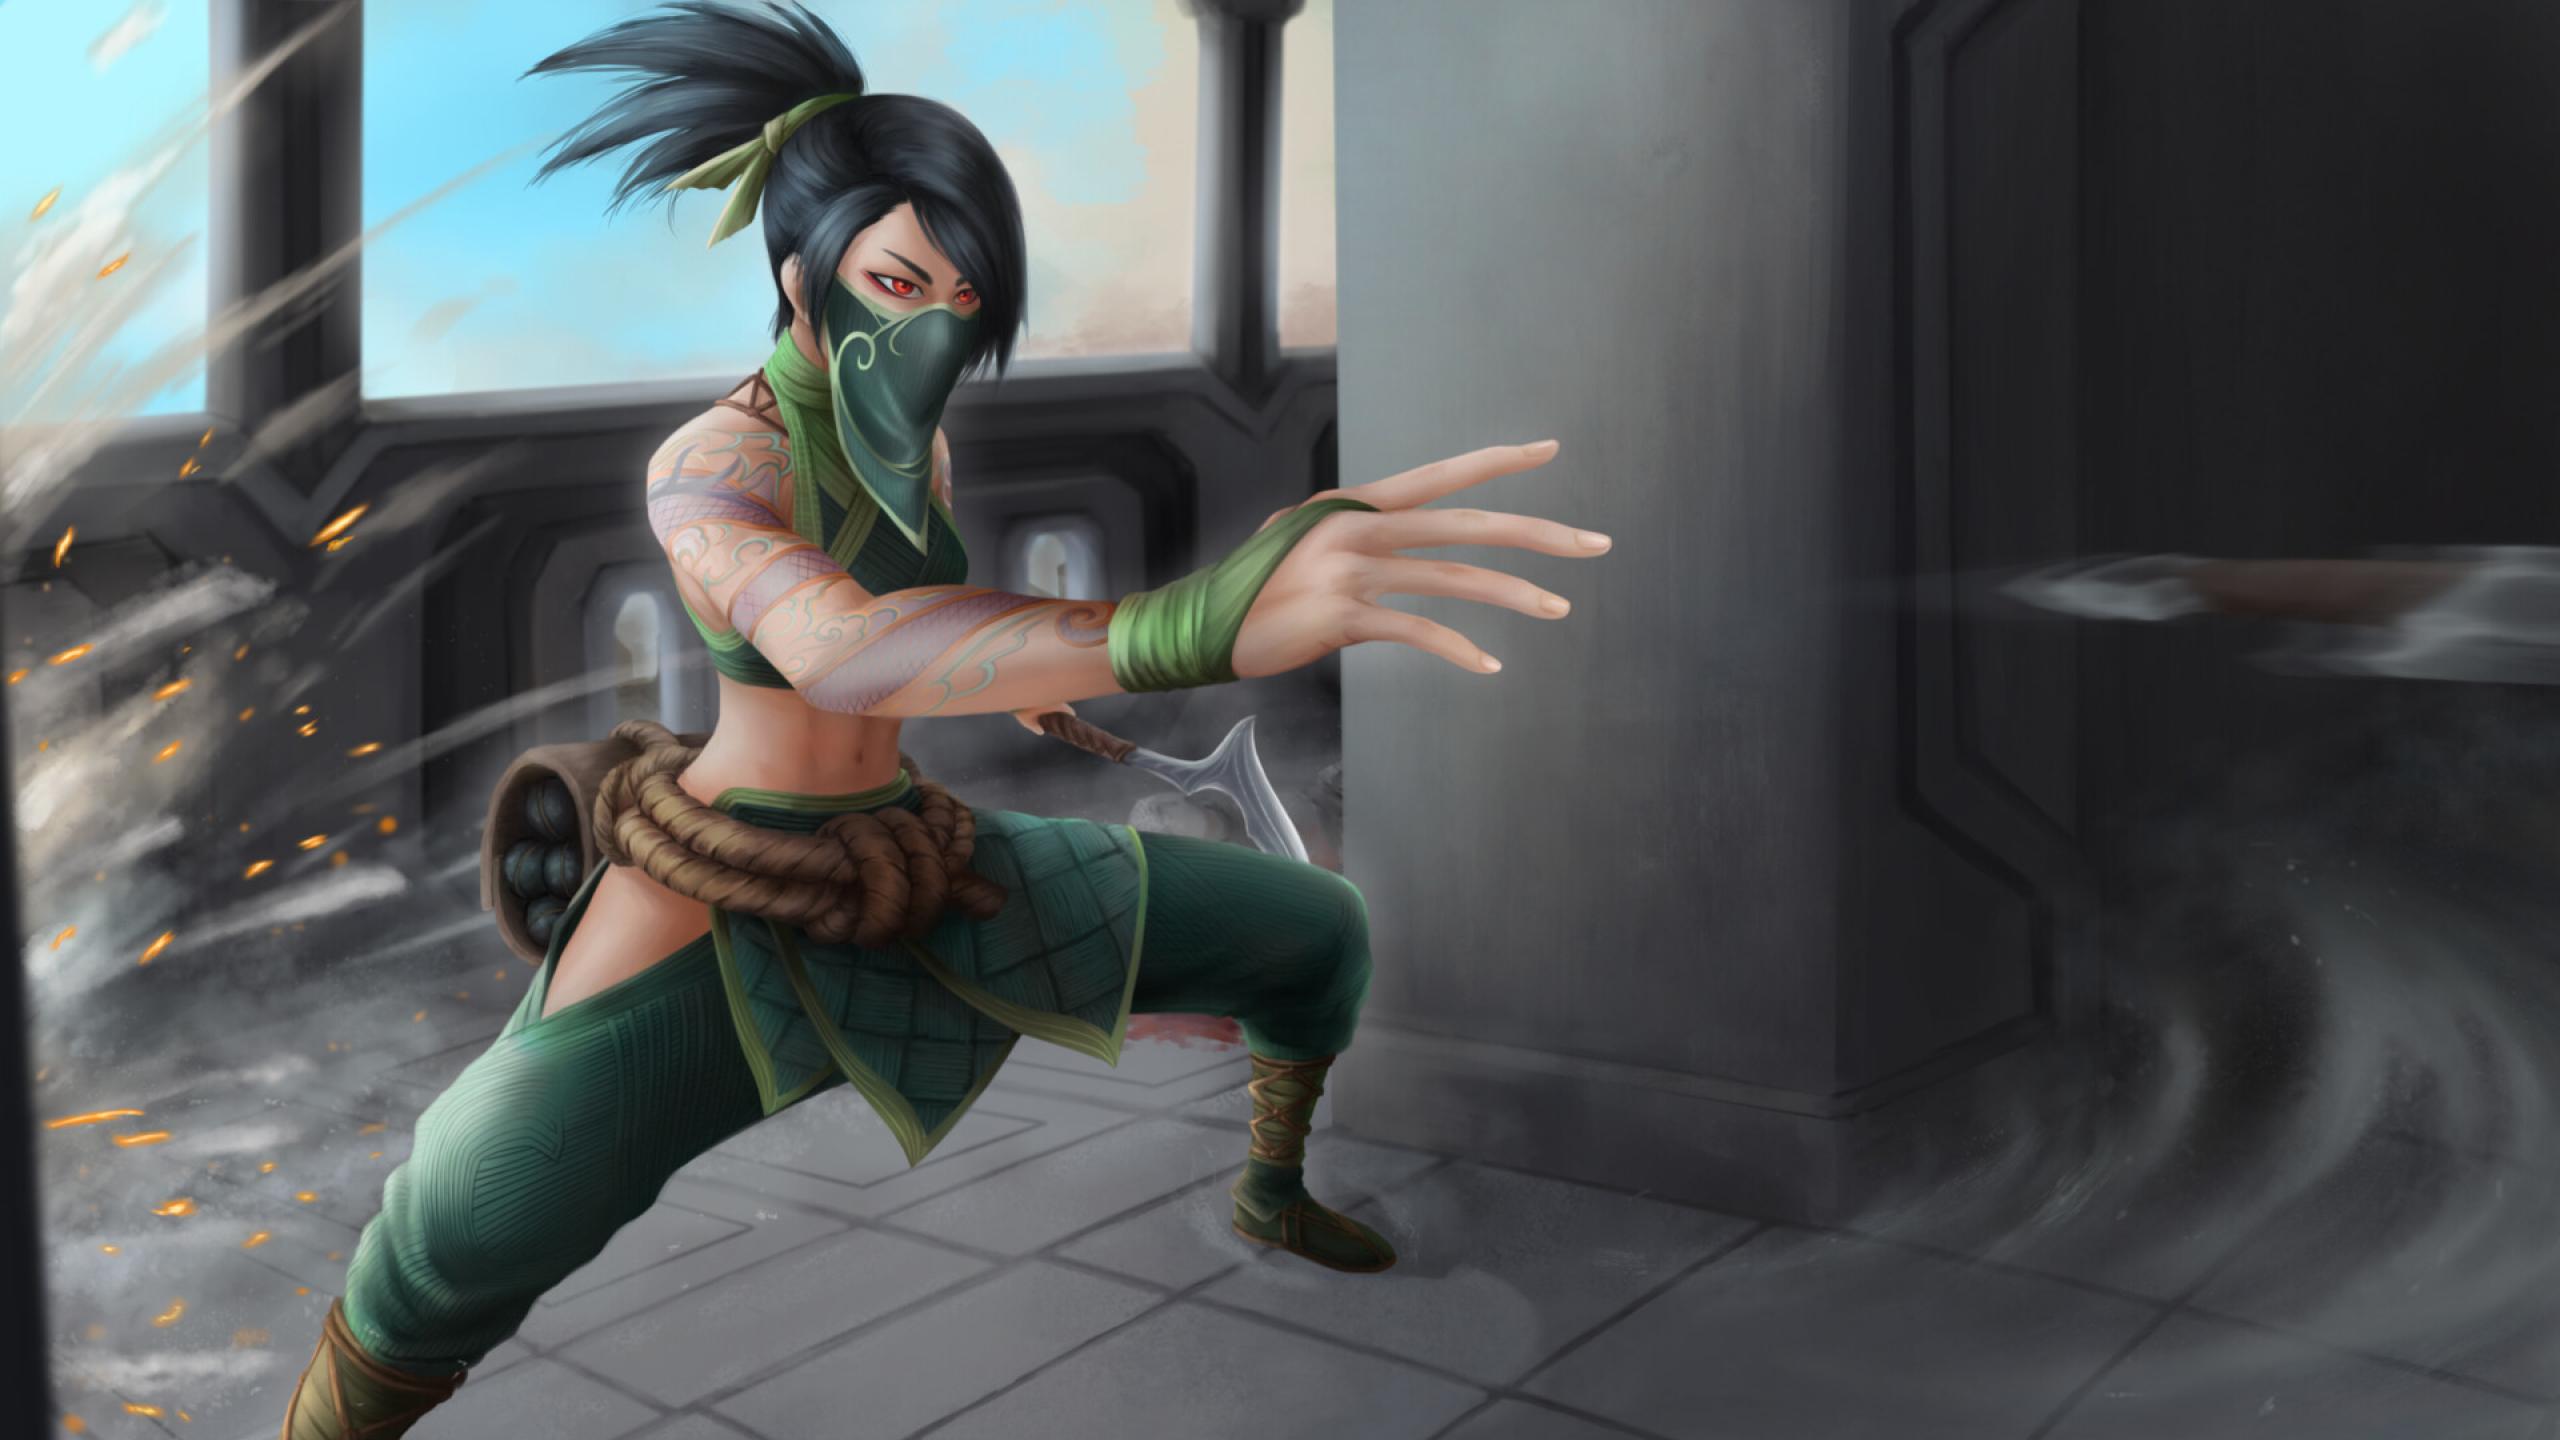 Akali from League Of Legends Wallpaper in 2560x1440 Resolution